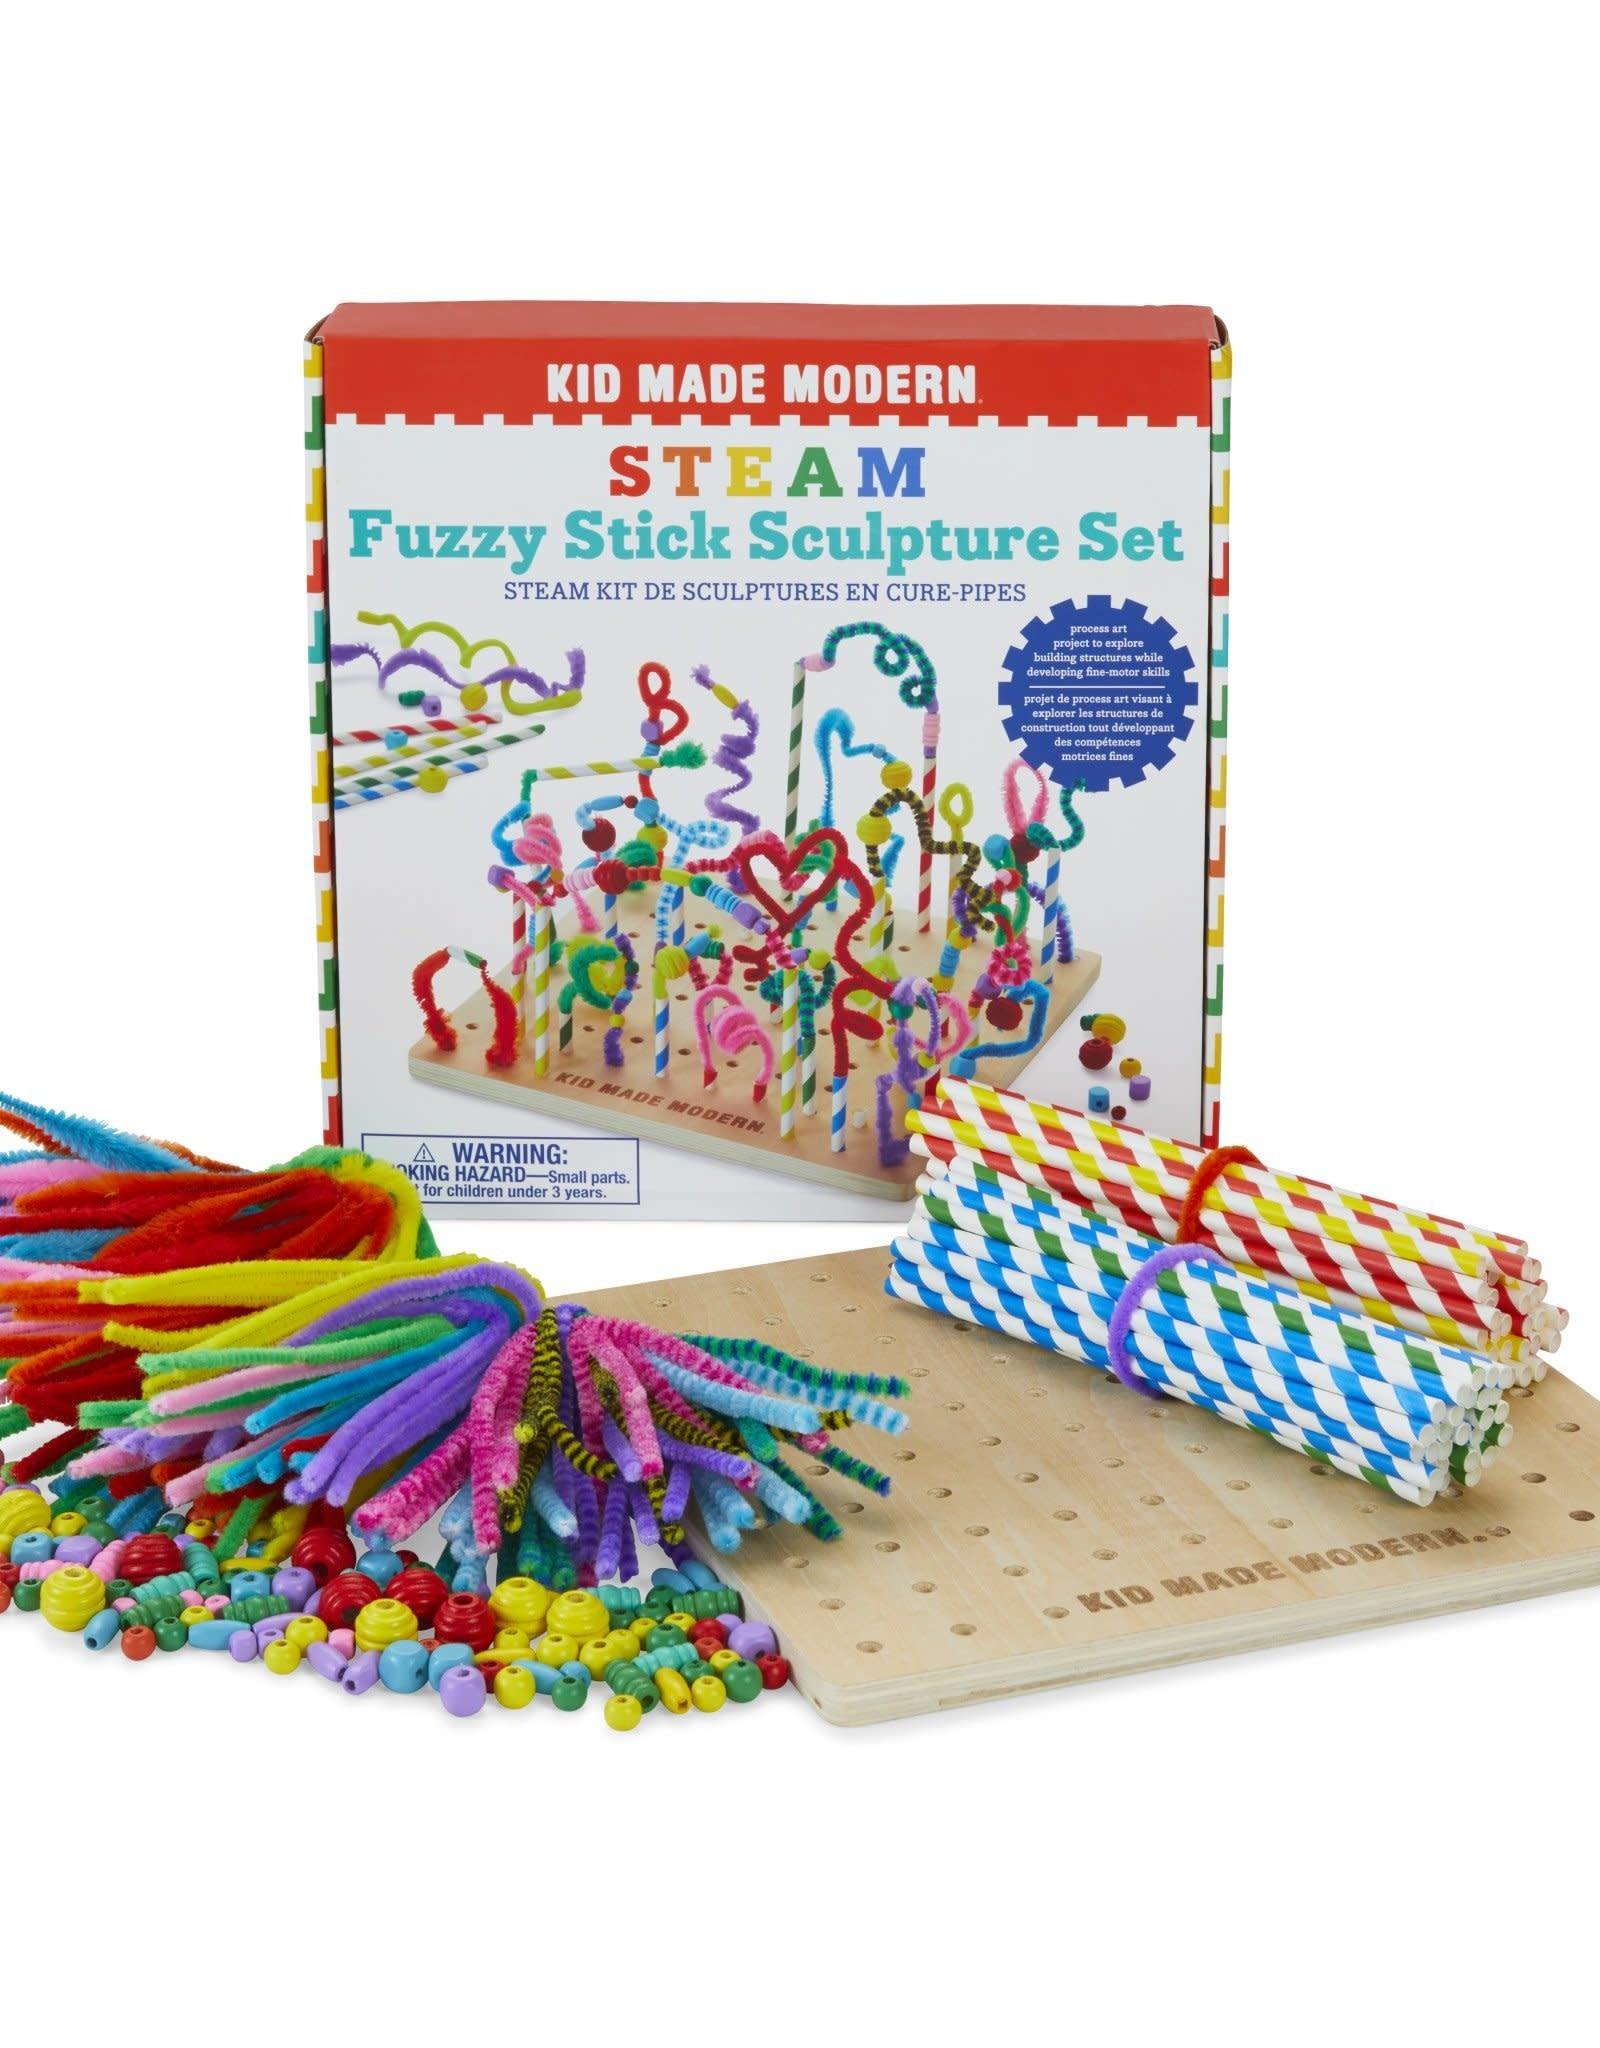 Kid Made Modern STEAM Fuzzy Stick Sculpture Set